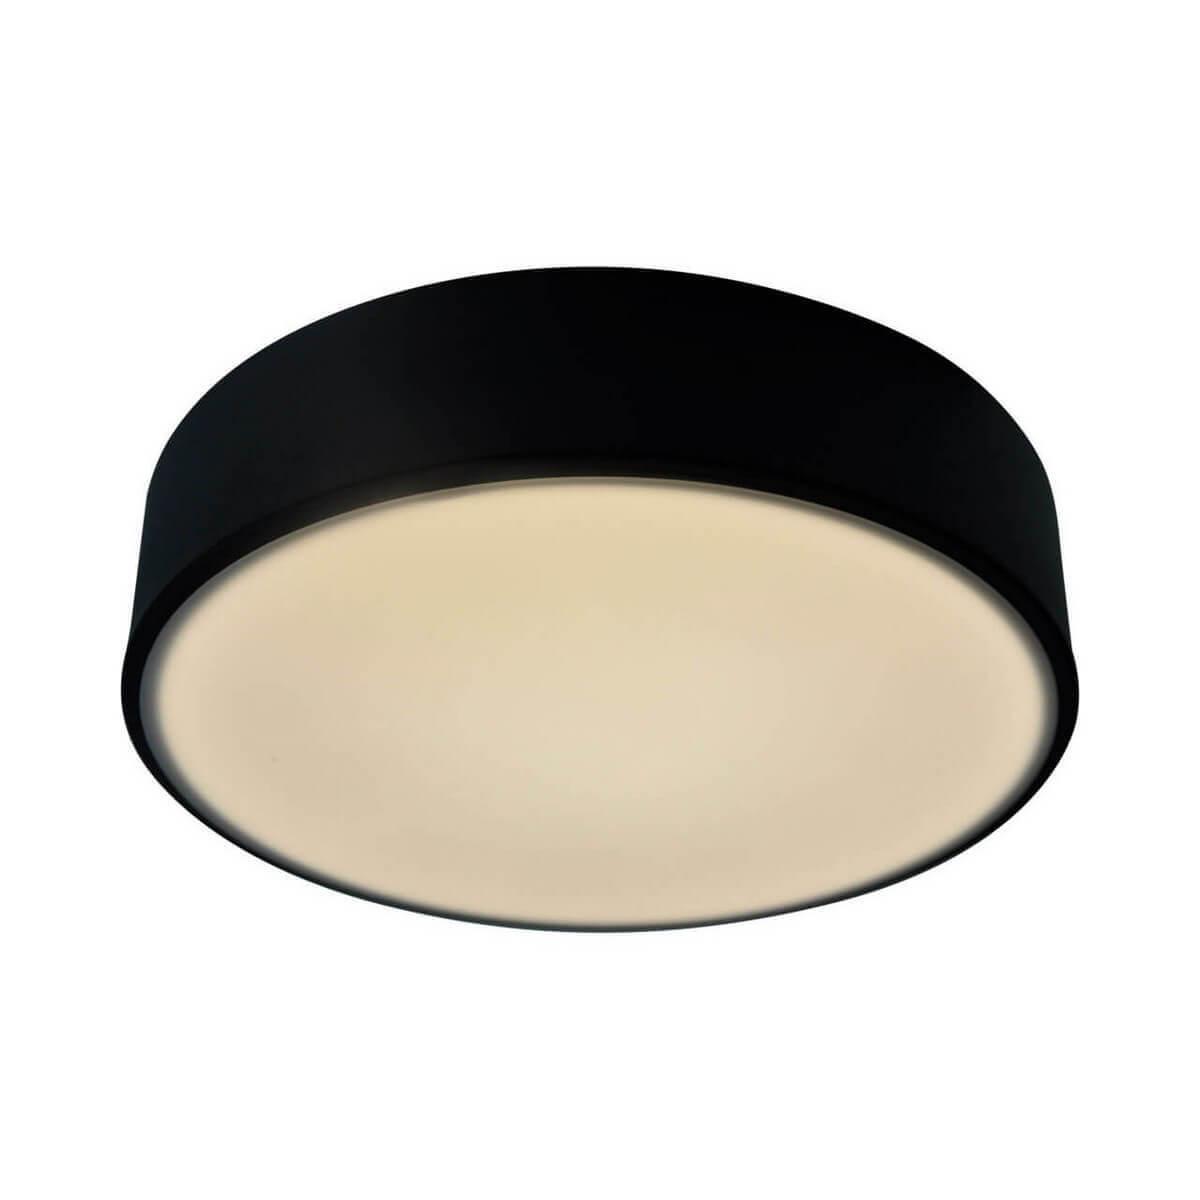 Светильник Kink Light 05423,19 Медина